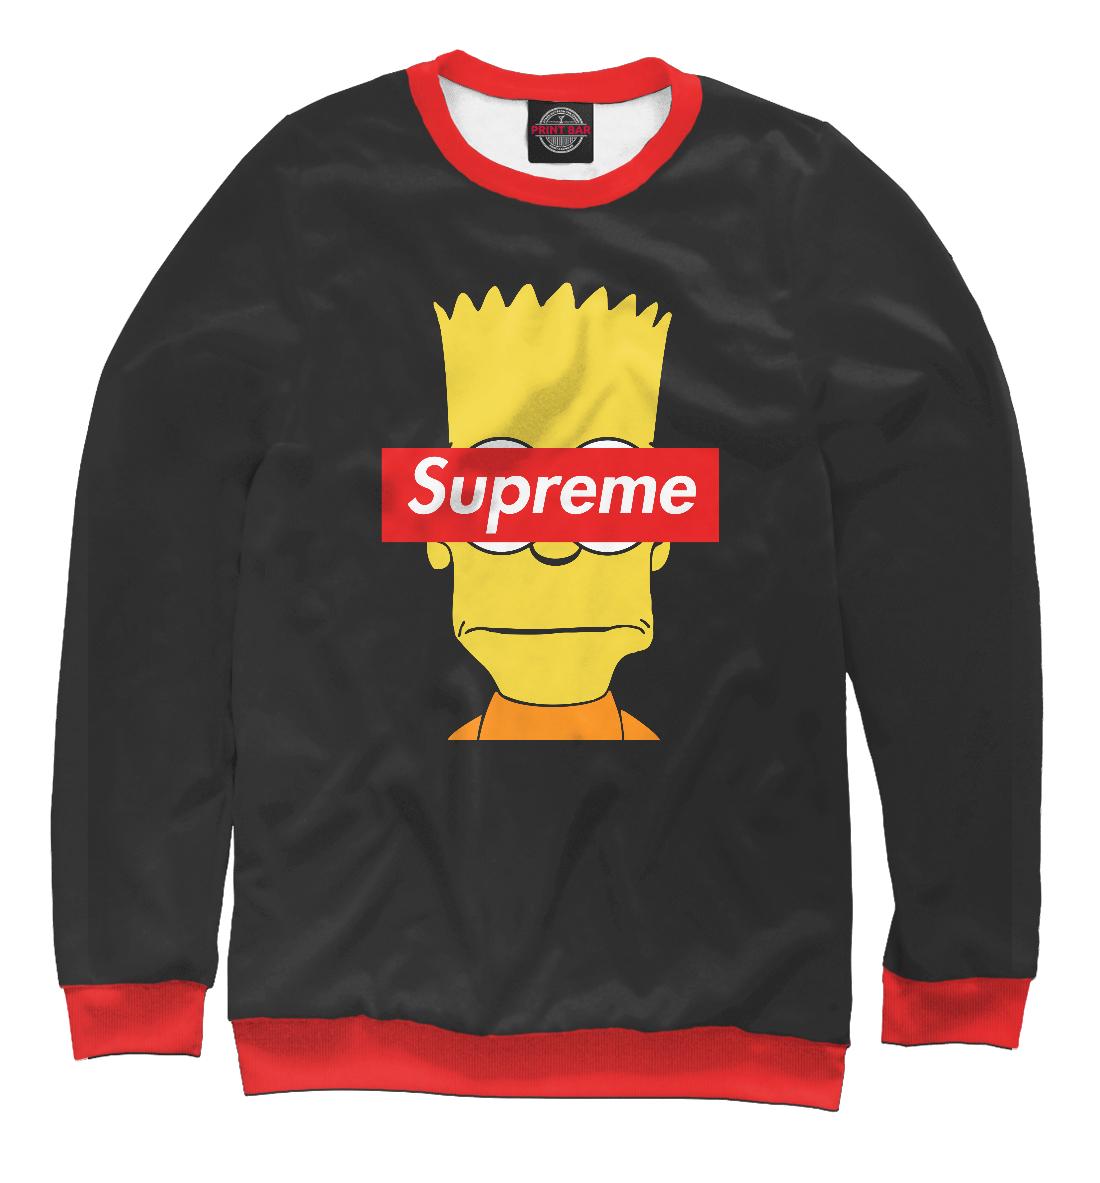 Supreme The Simpsons, Printbar, Свитшоты, SPR-965366-swi-2  - купить со скидкой